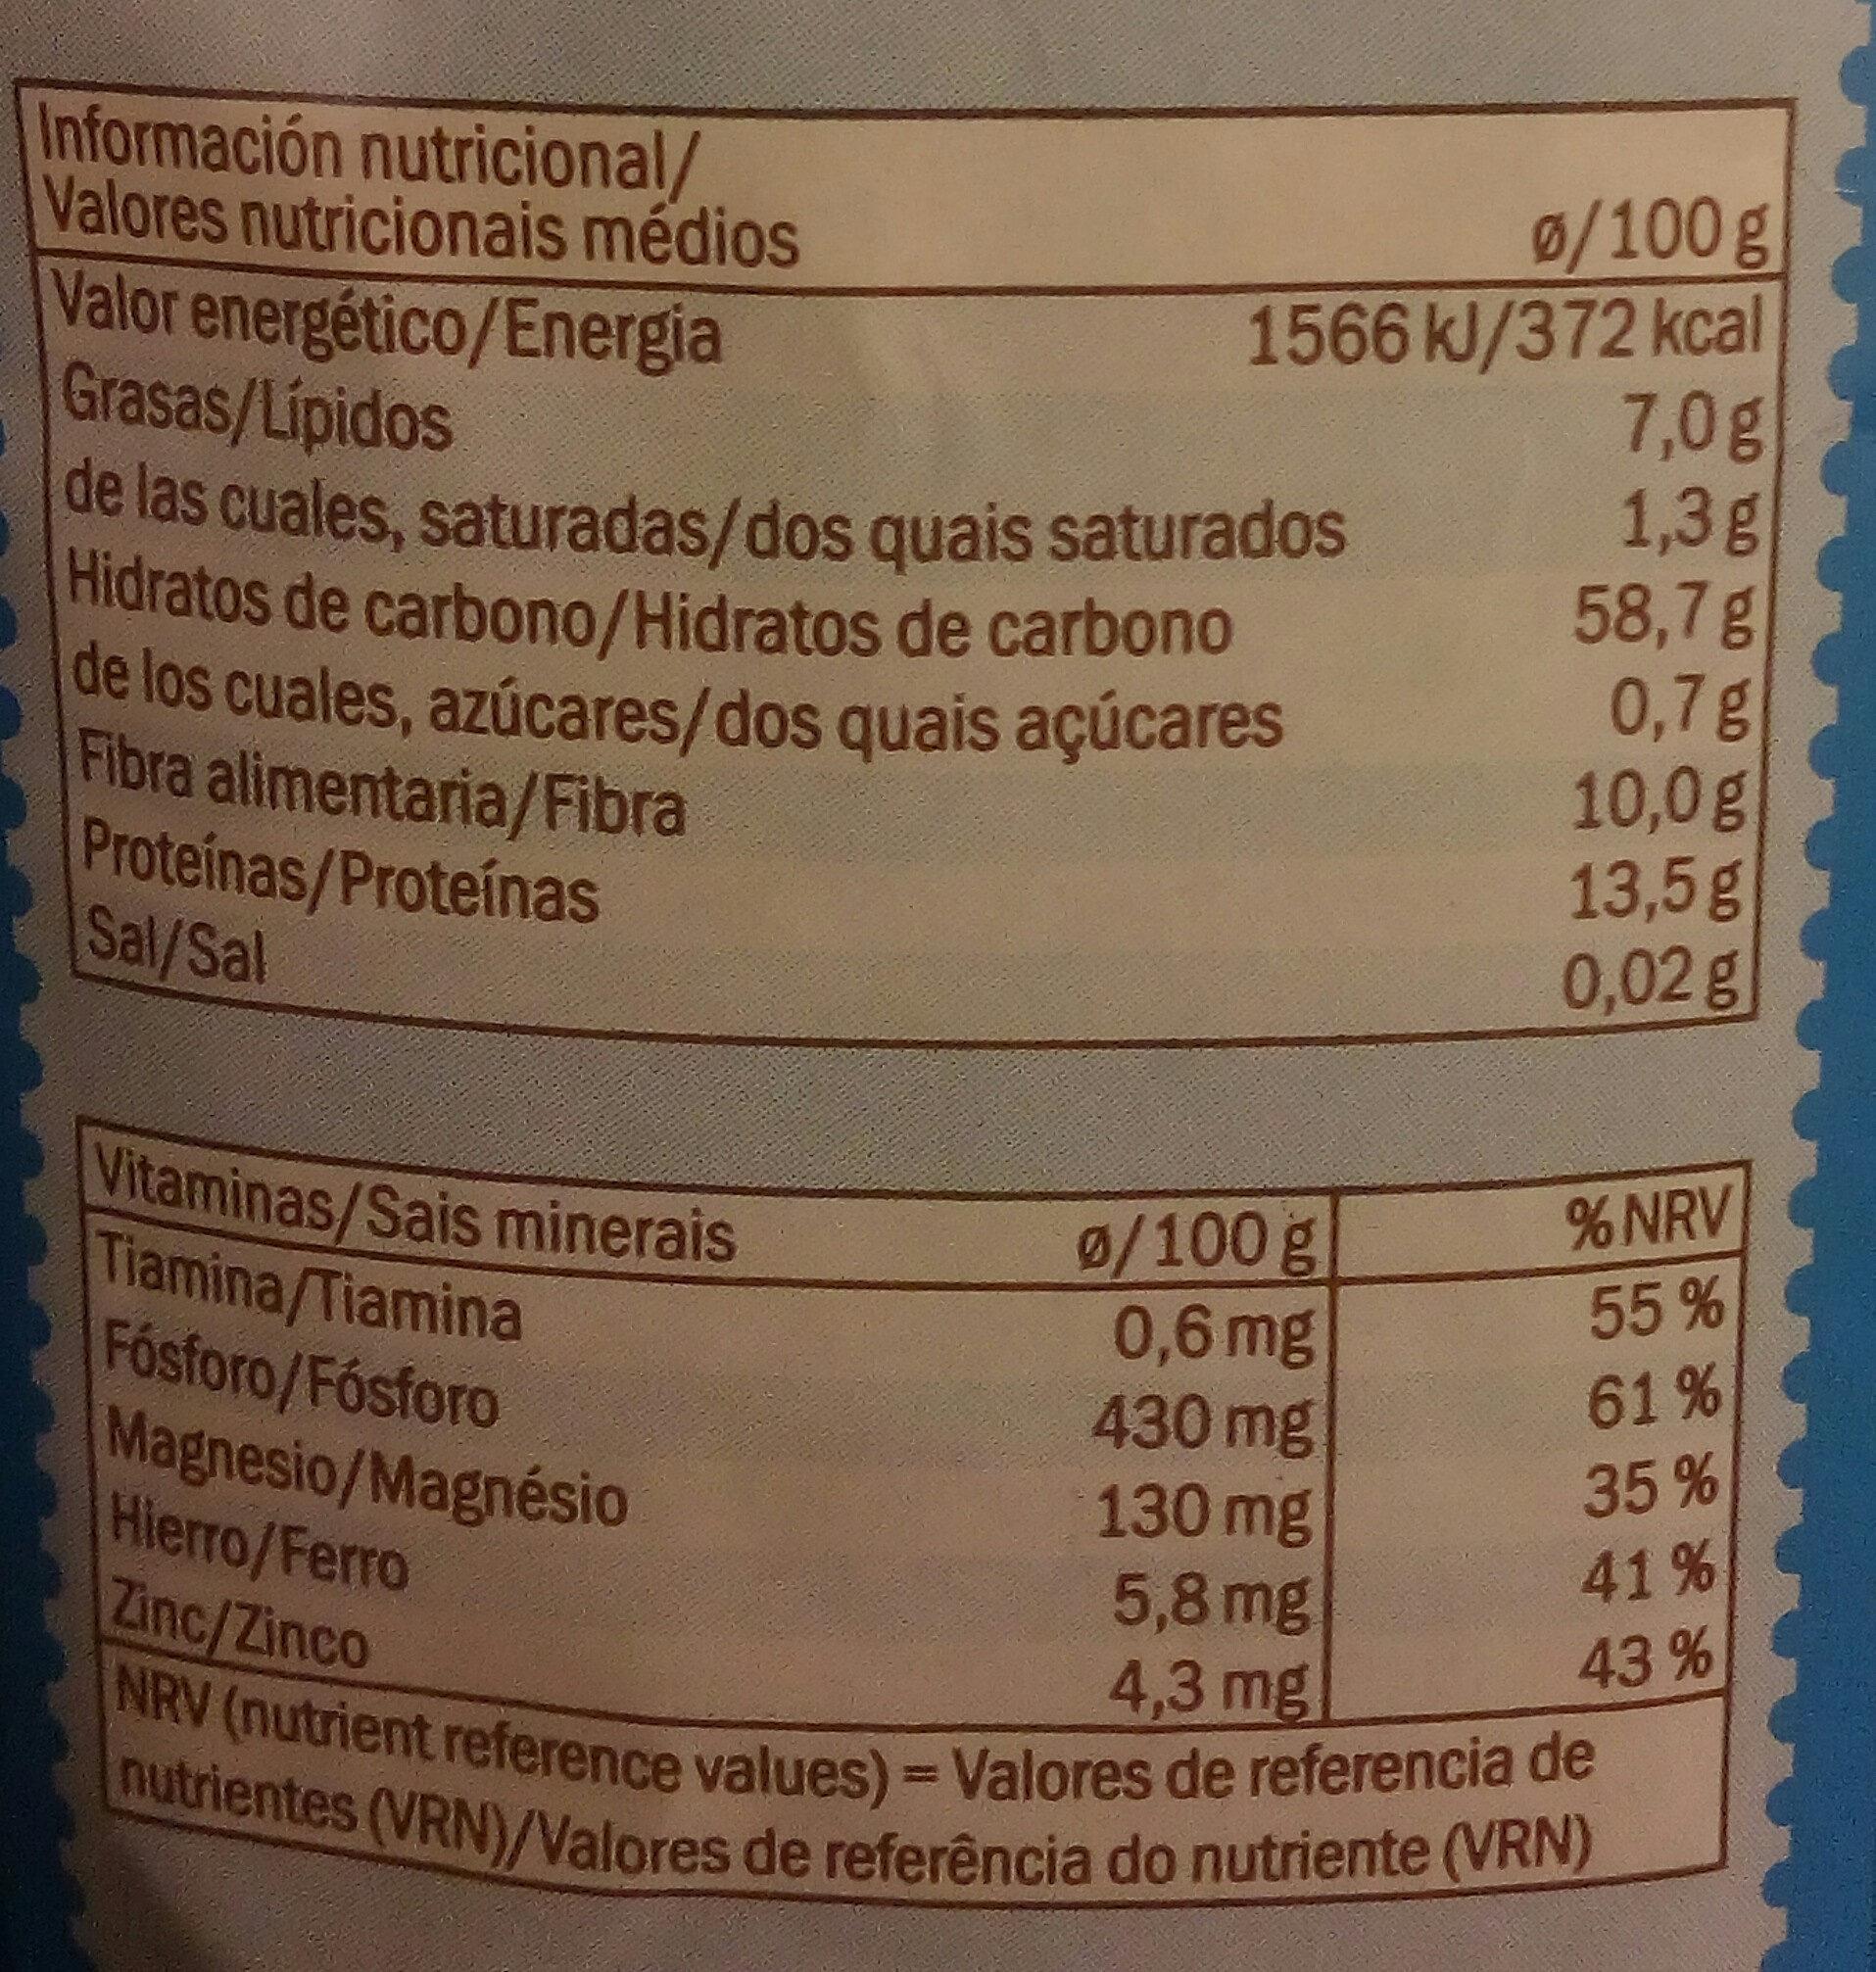 Flocons d'avoine complets - Informació nutricional - ca